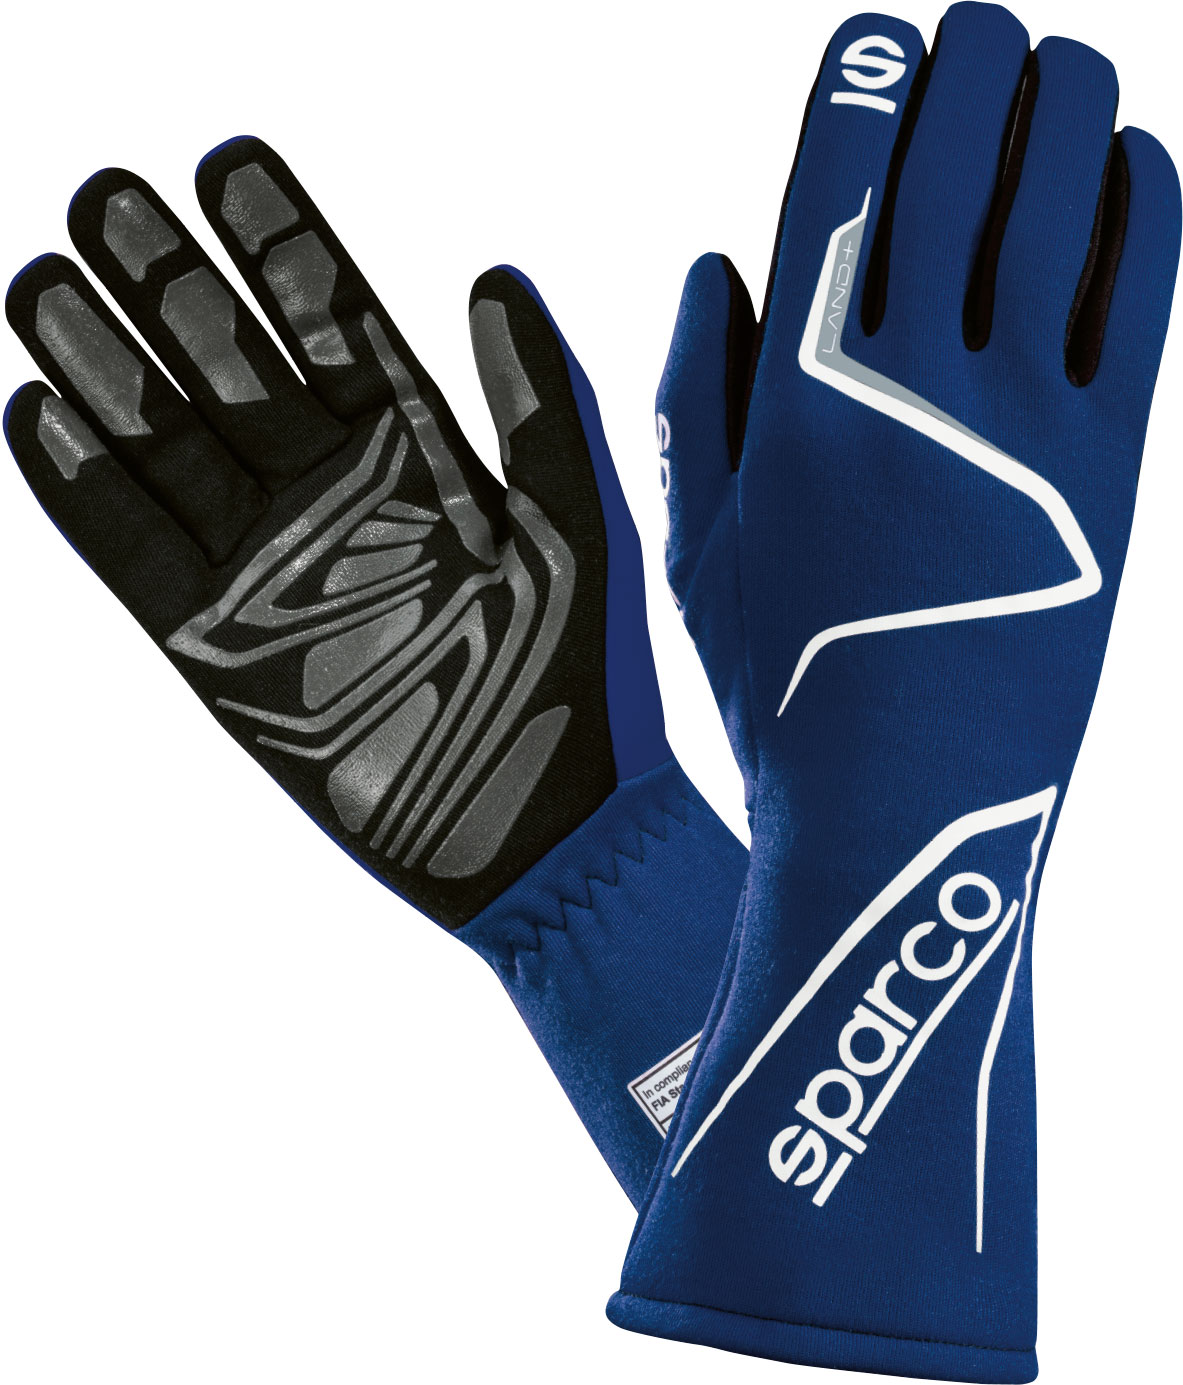 Sparco Handschuh Land+, blau